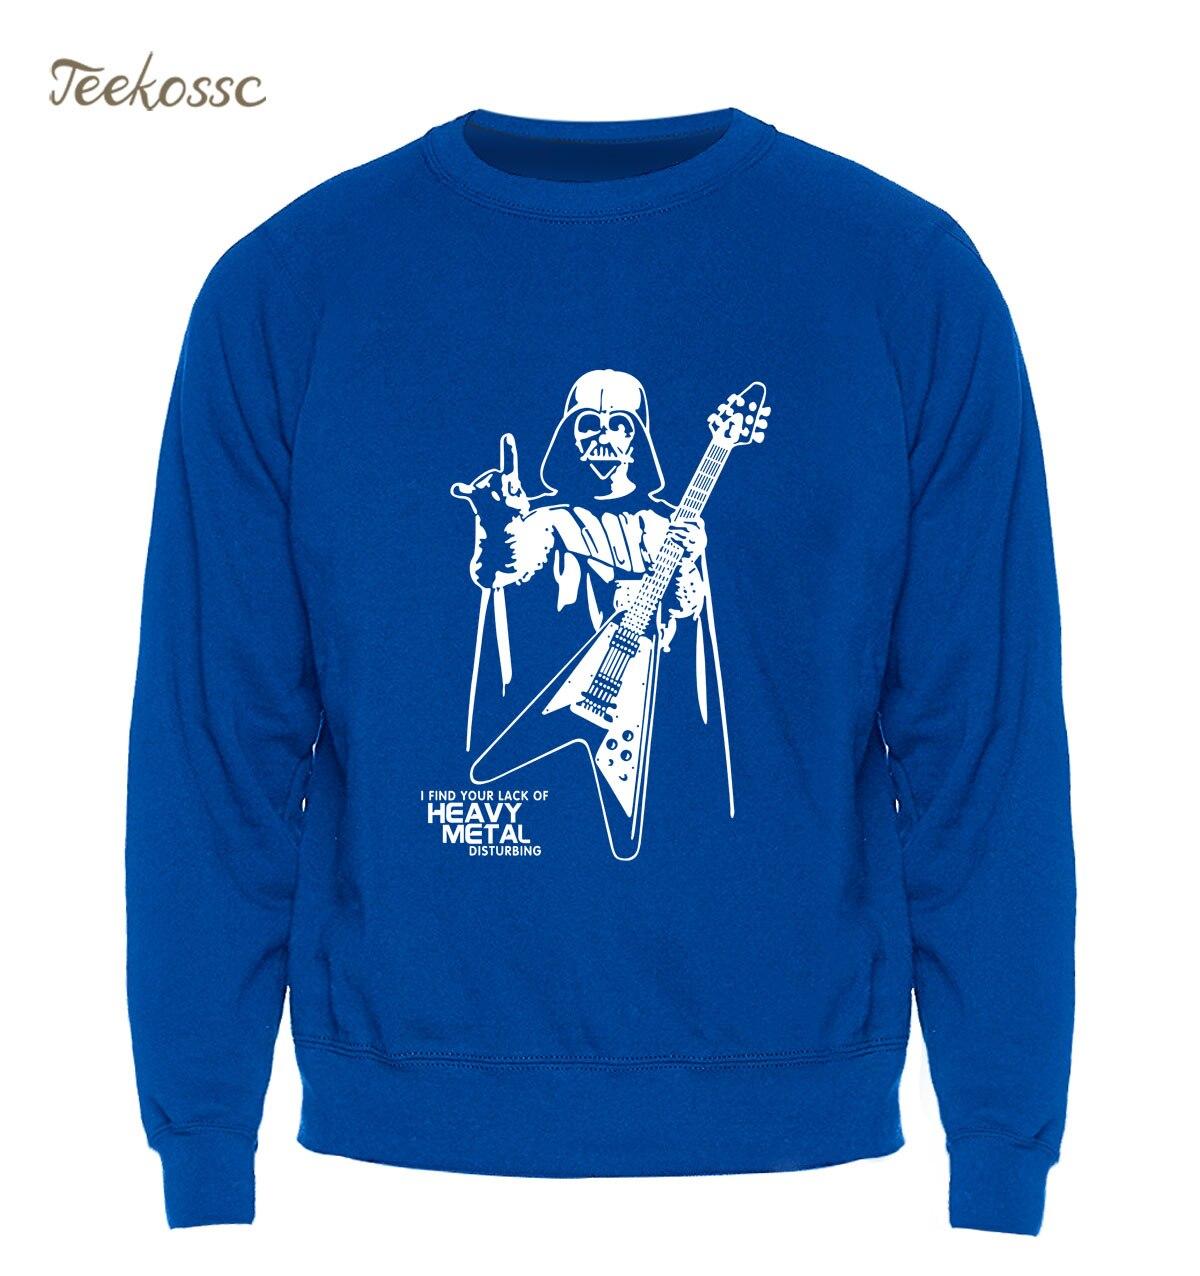 US $10.56 38% OFF|Star Wars Hoodie Darth Vader Sweatshirt Men Heavy Metal Designer Funny Sweatshirts Winter Autumn Fleece Warm Streetwear